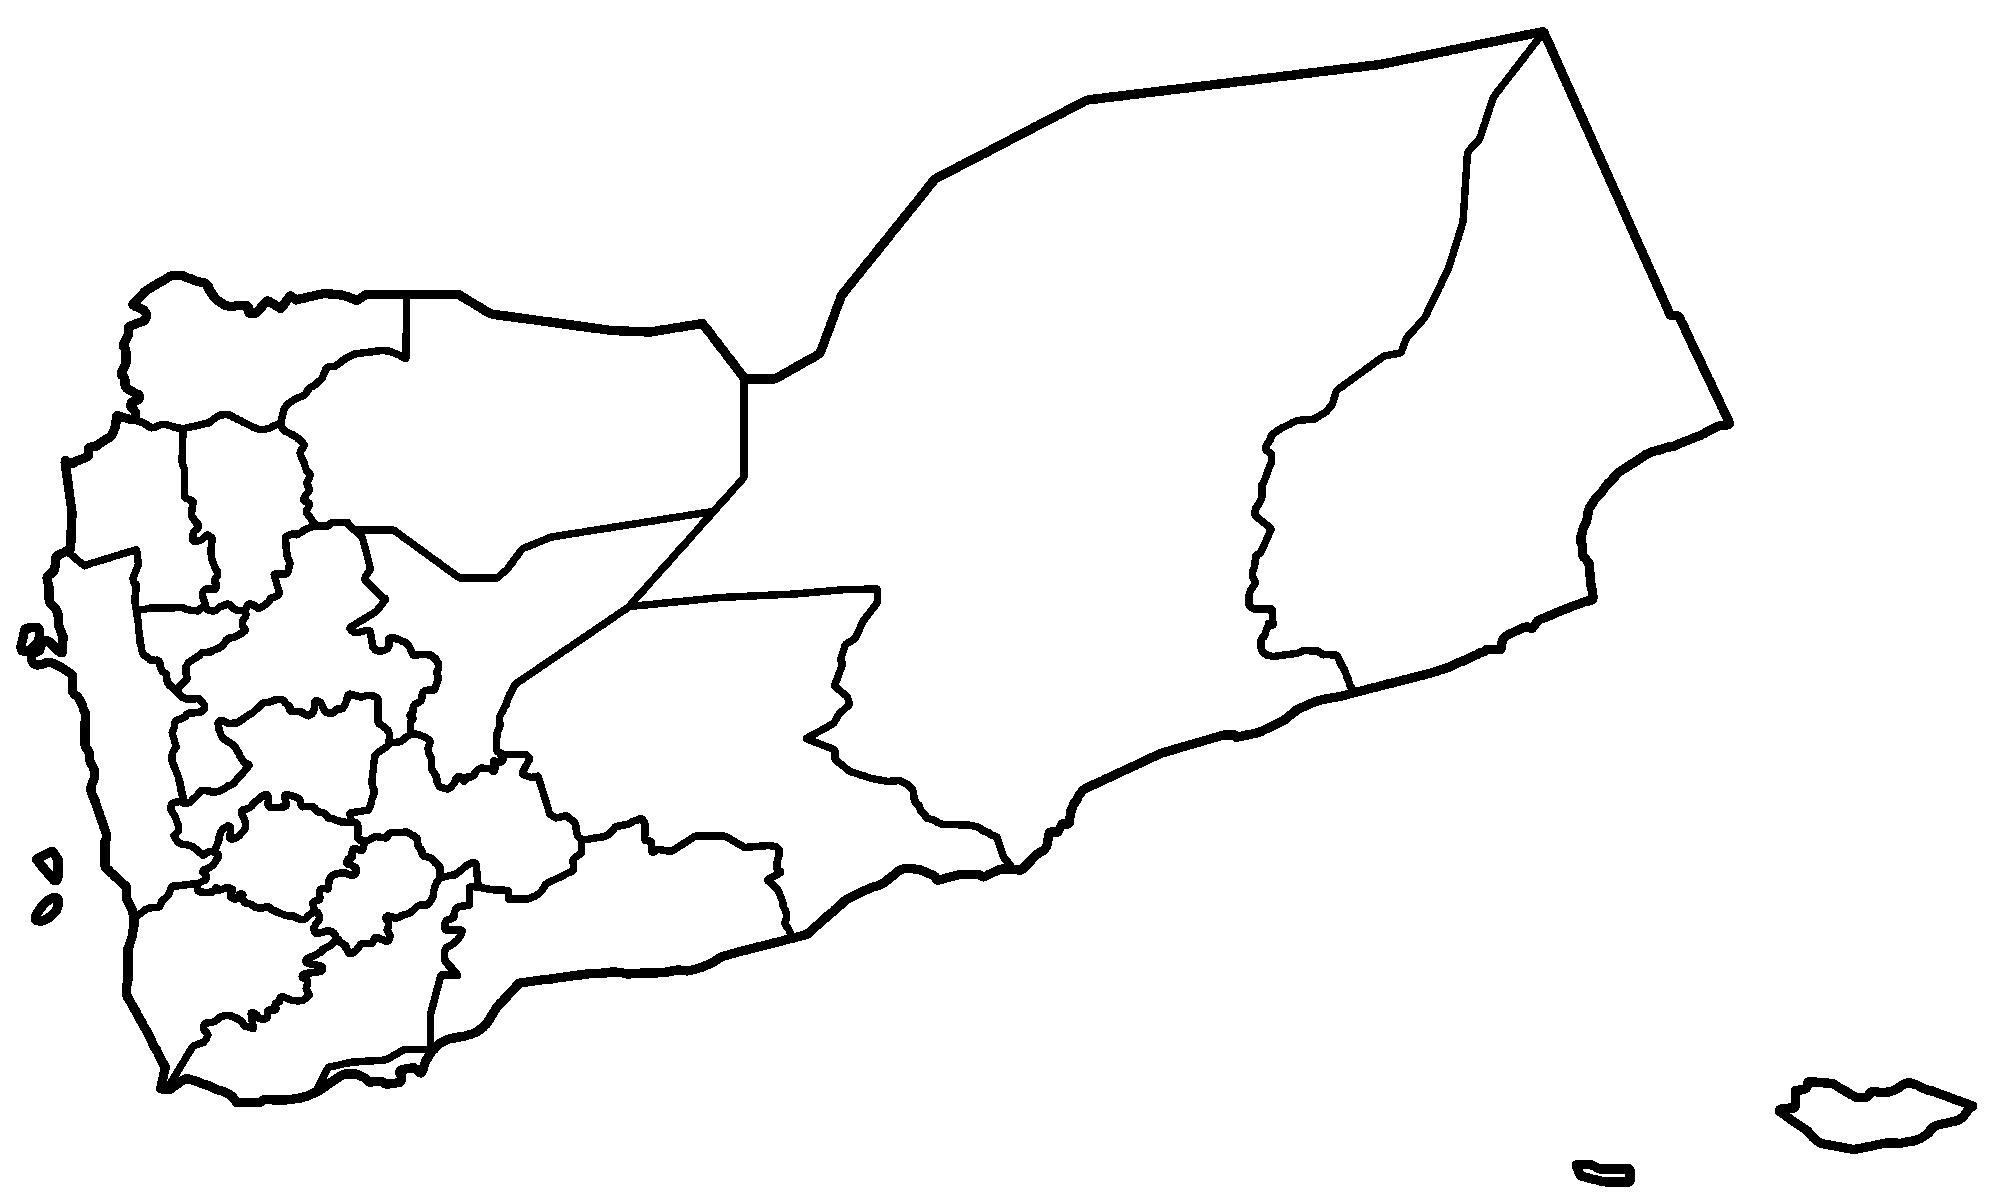 FileYemen Governorates Blankpng Wikimedia Commons - Yemen map png